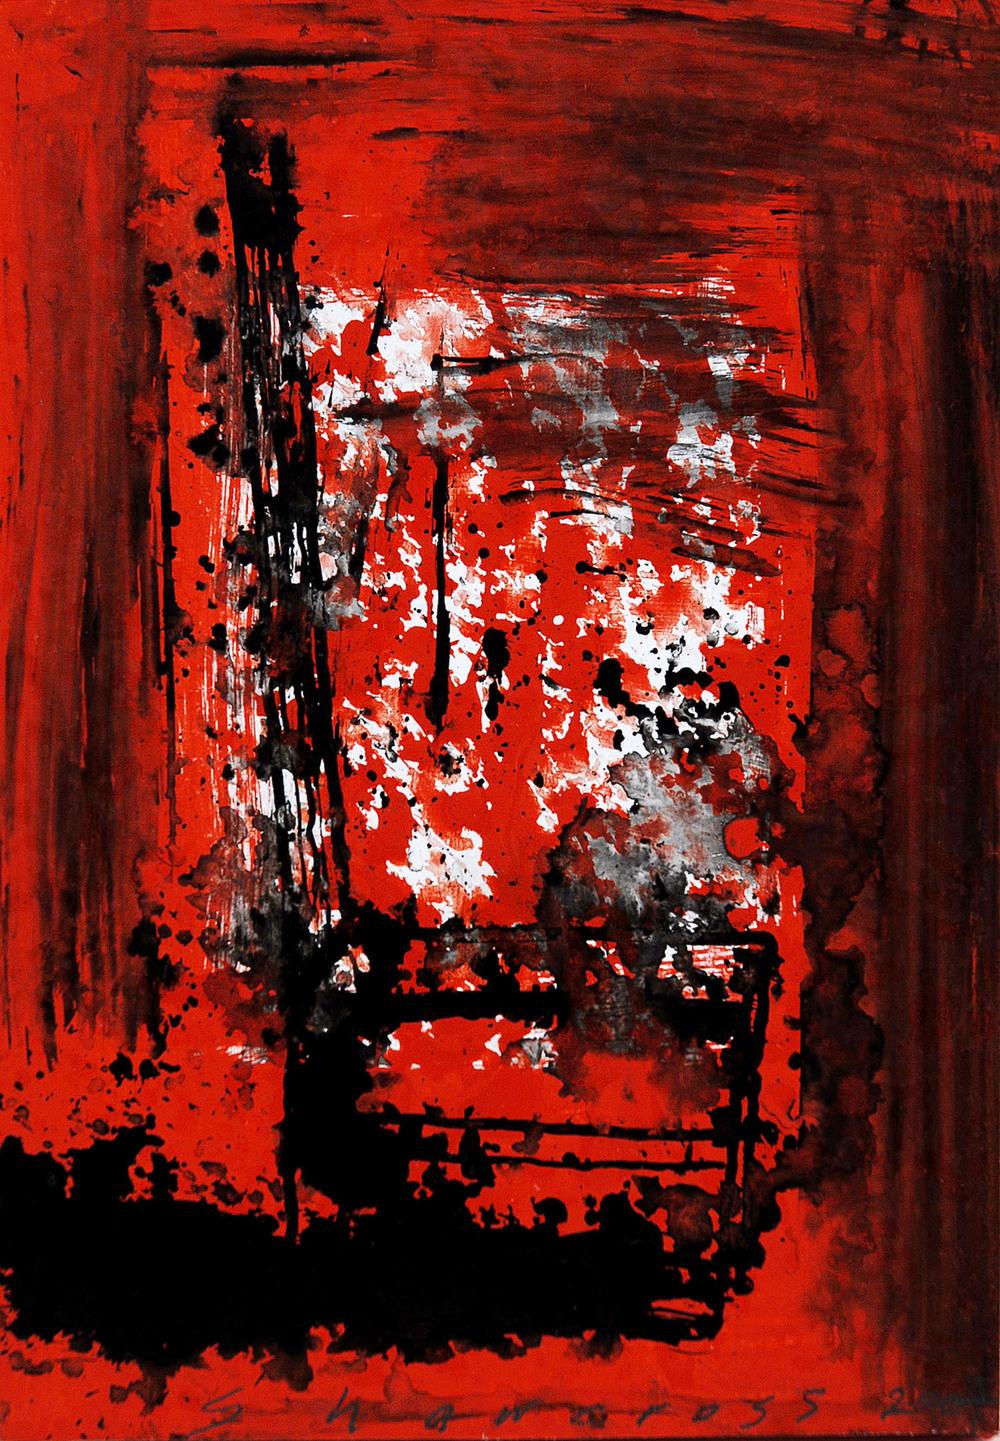 Neil Shawcross_2007_Chair #11_acrylic on board_20 x 13.5cm.jpg